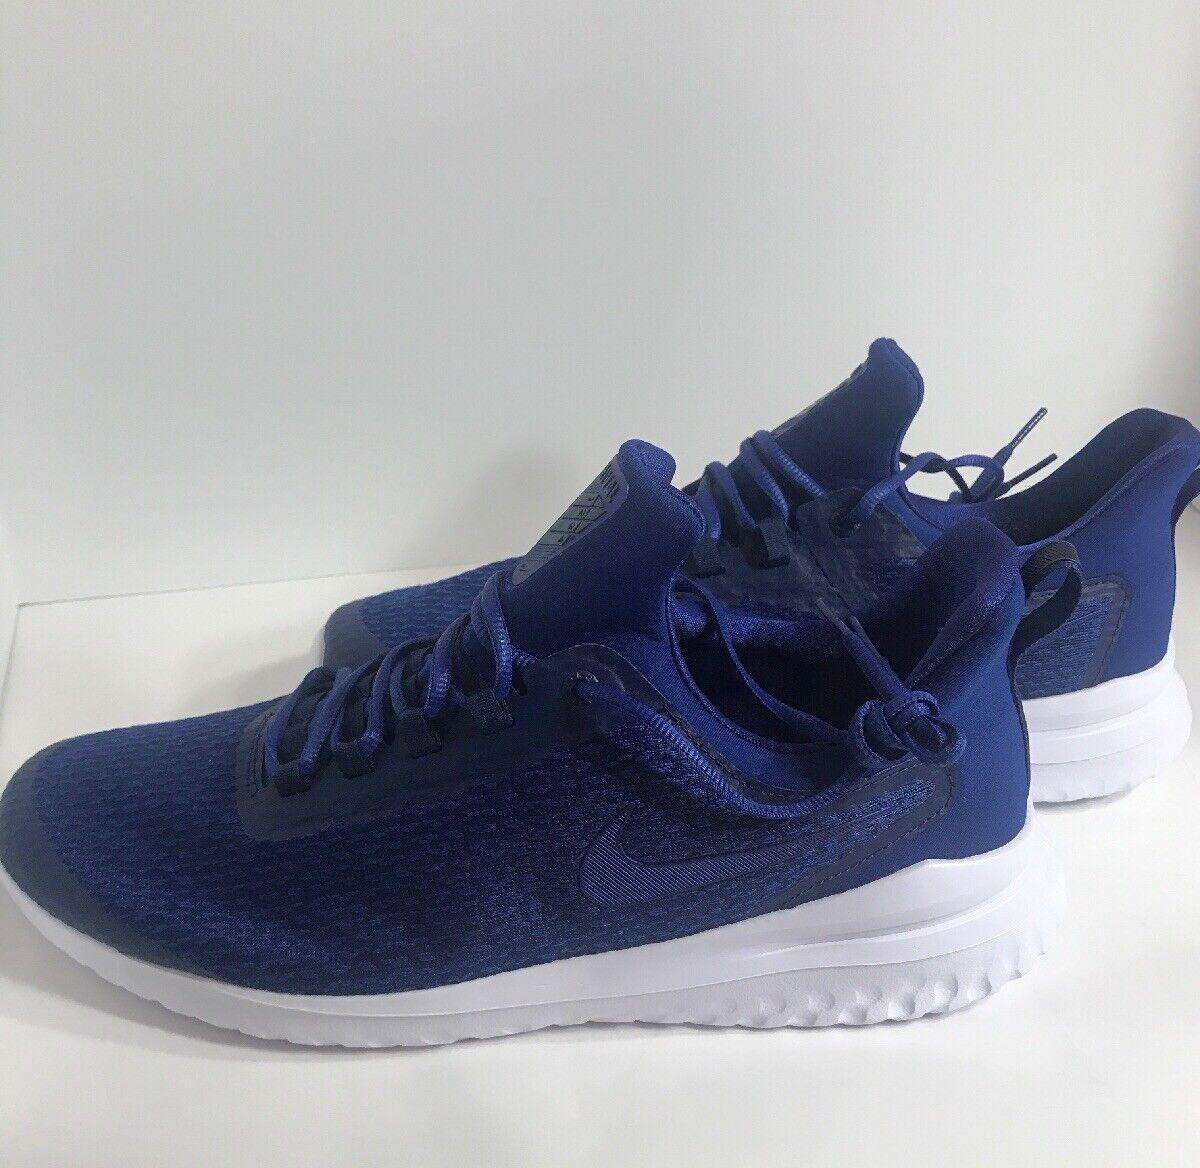 Neuf Sans Boîte Homme NIKE renouveler Rival Chaussures bleu deep royal Taille  14